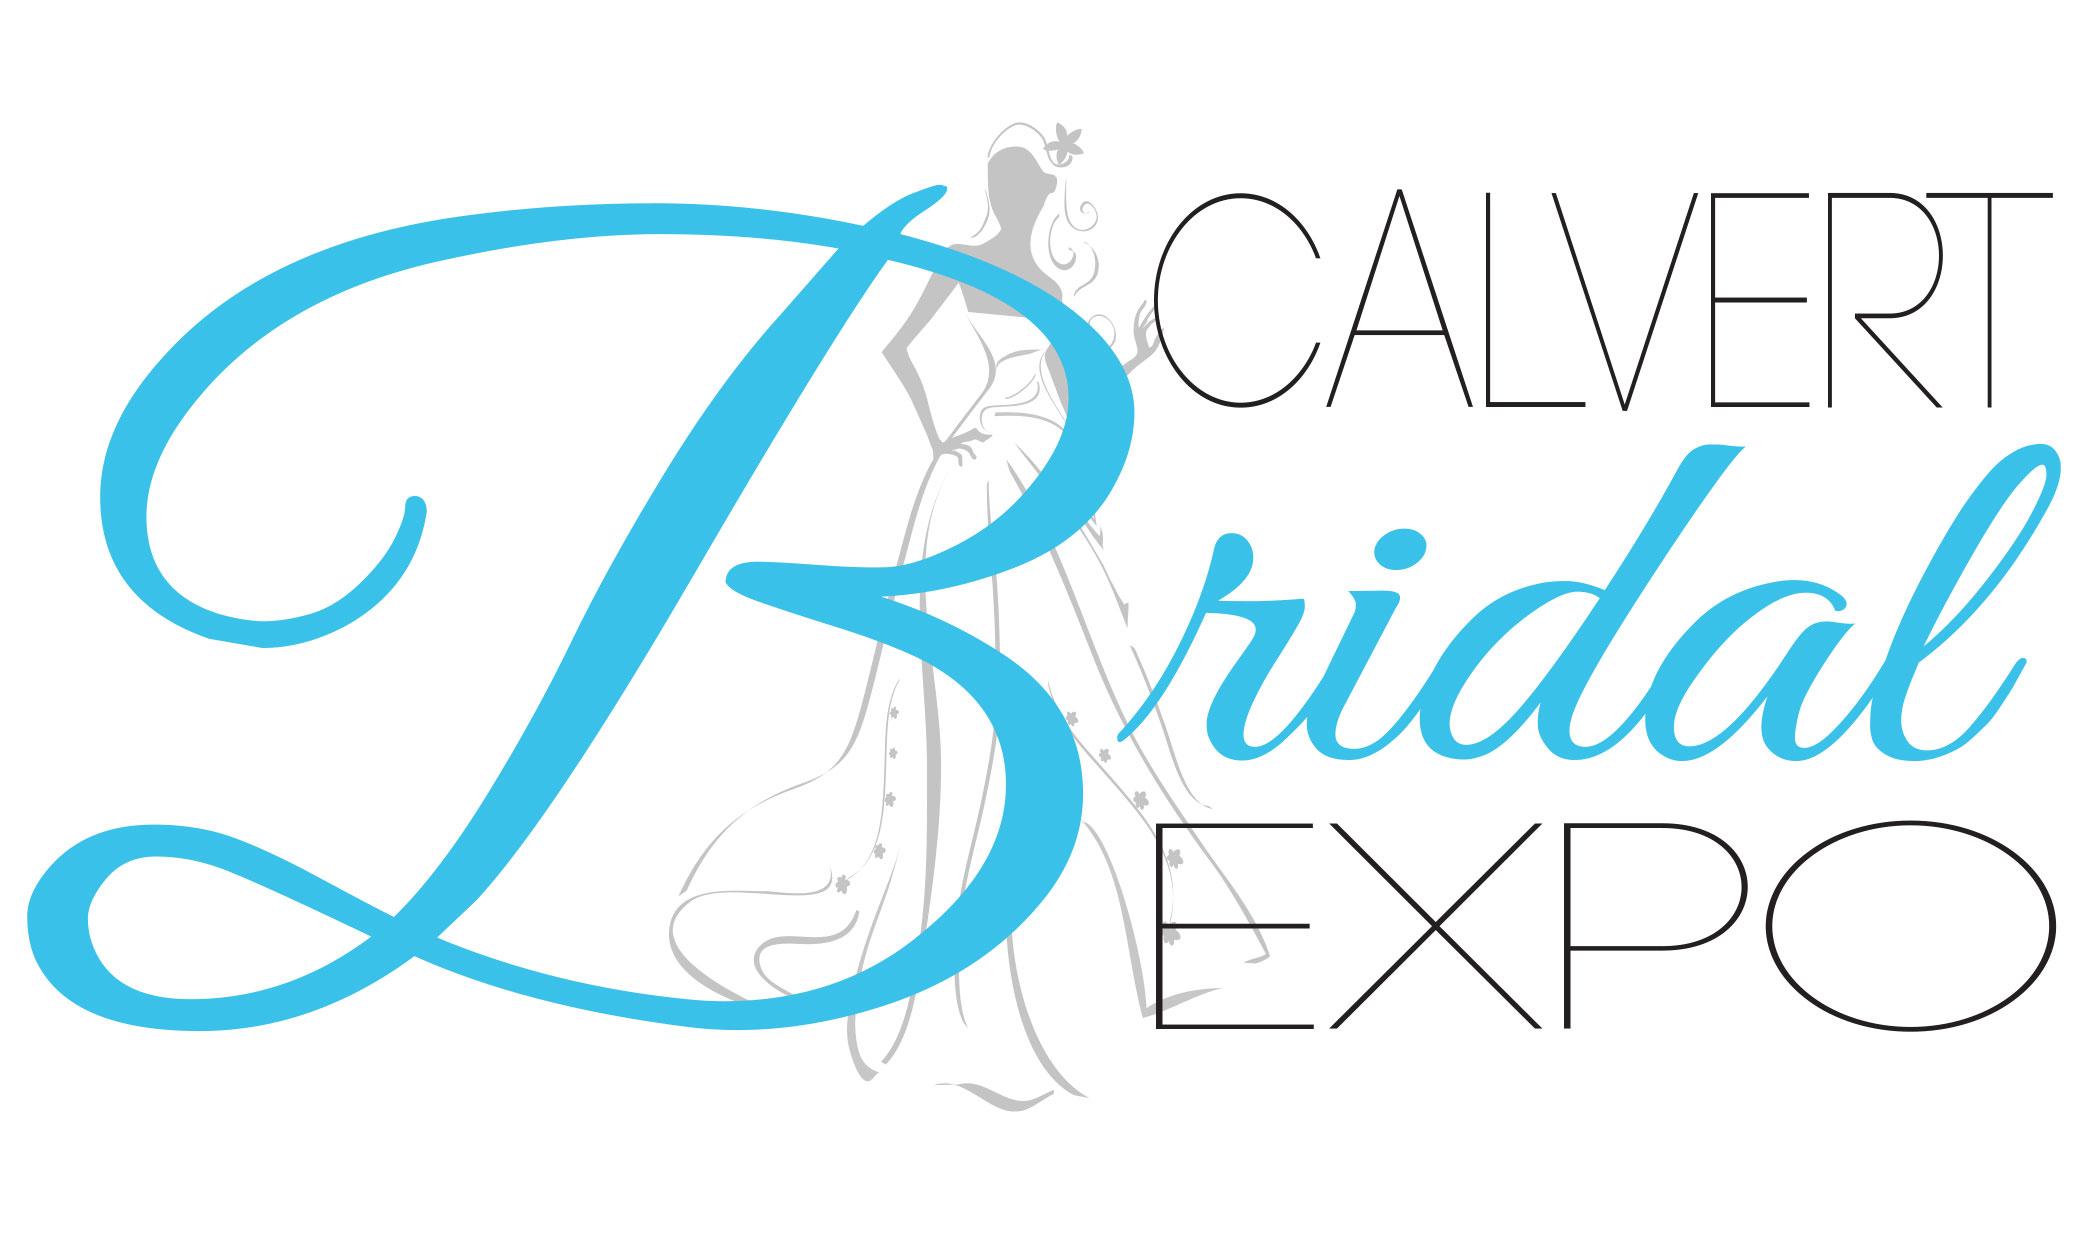 12th Annual Calvert Bridal Expo